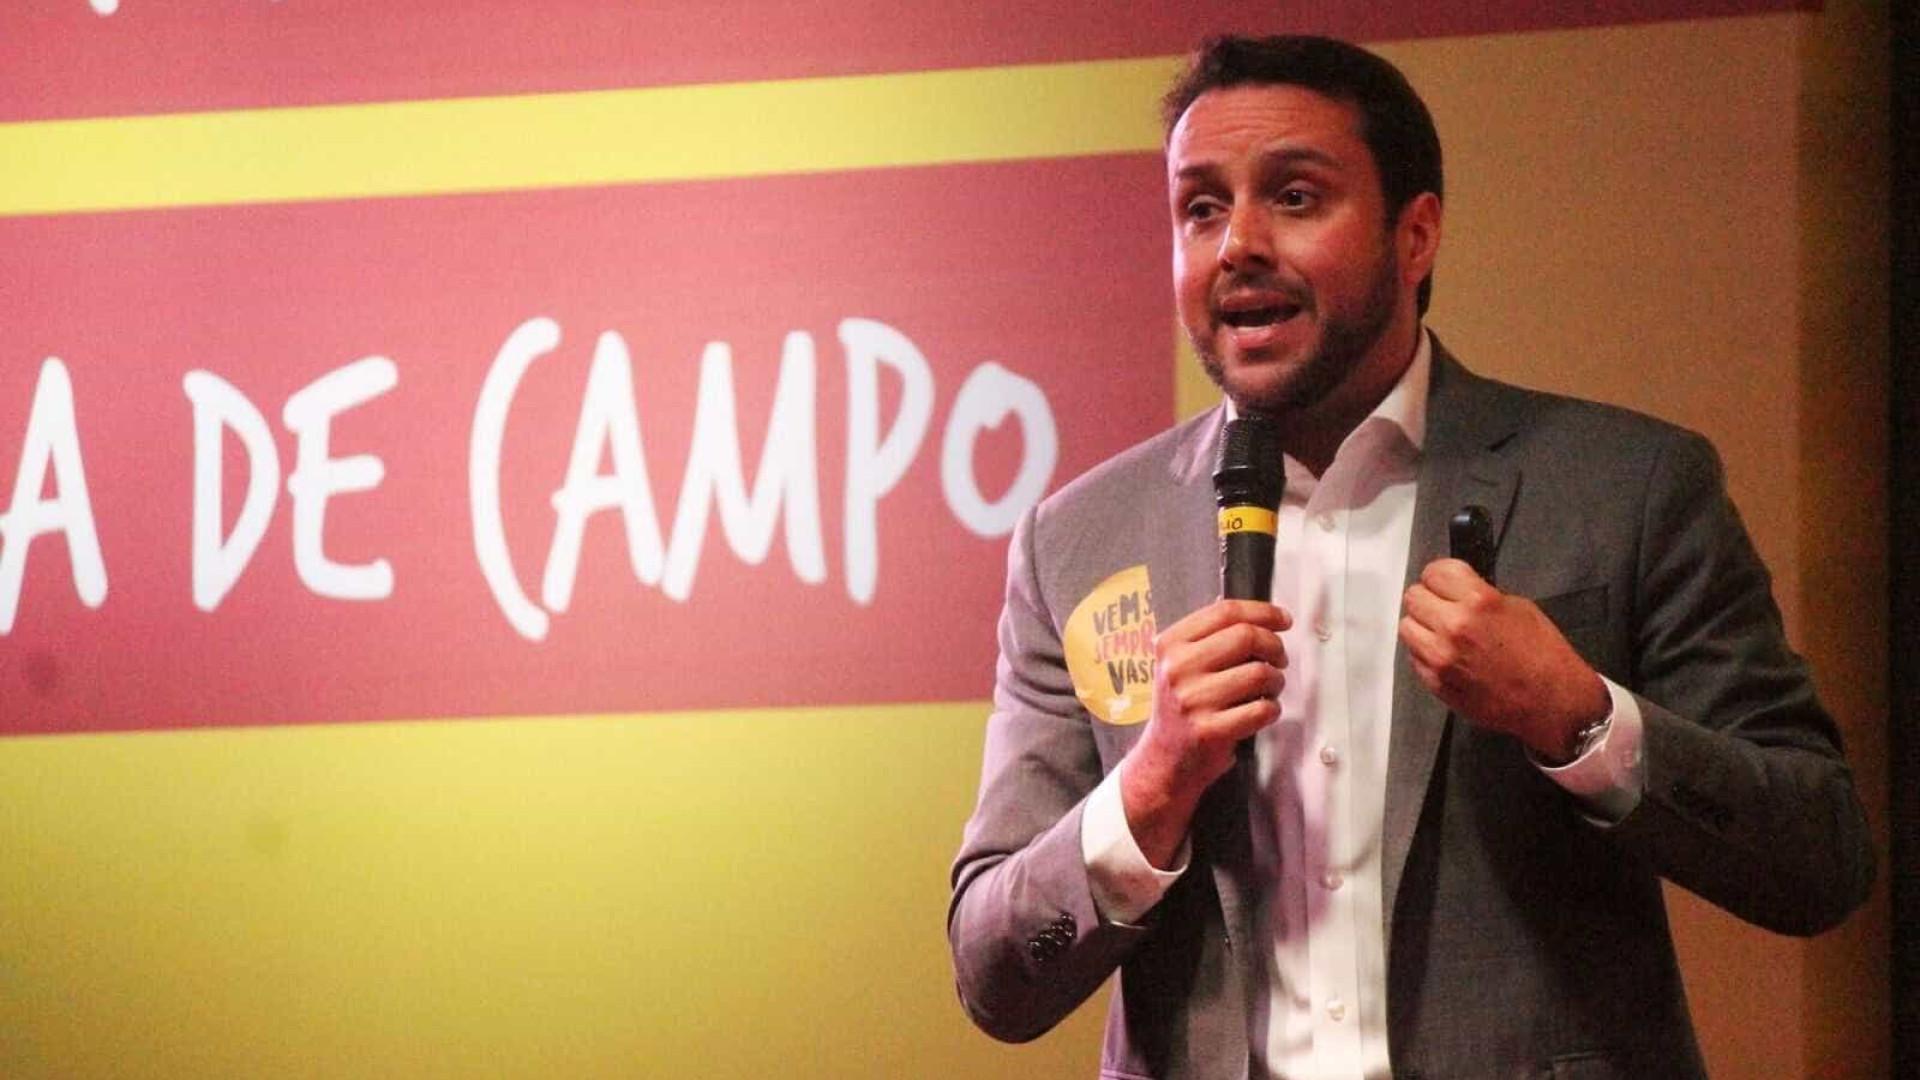 Presidente eleito acusa Eurico Miranda de permitir saques no Vasco